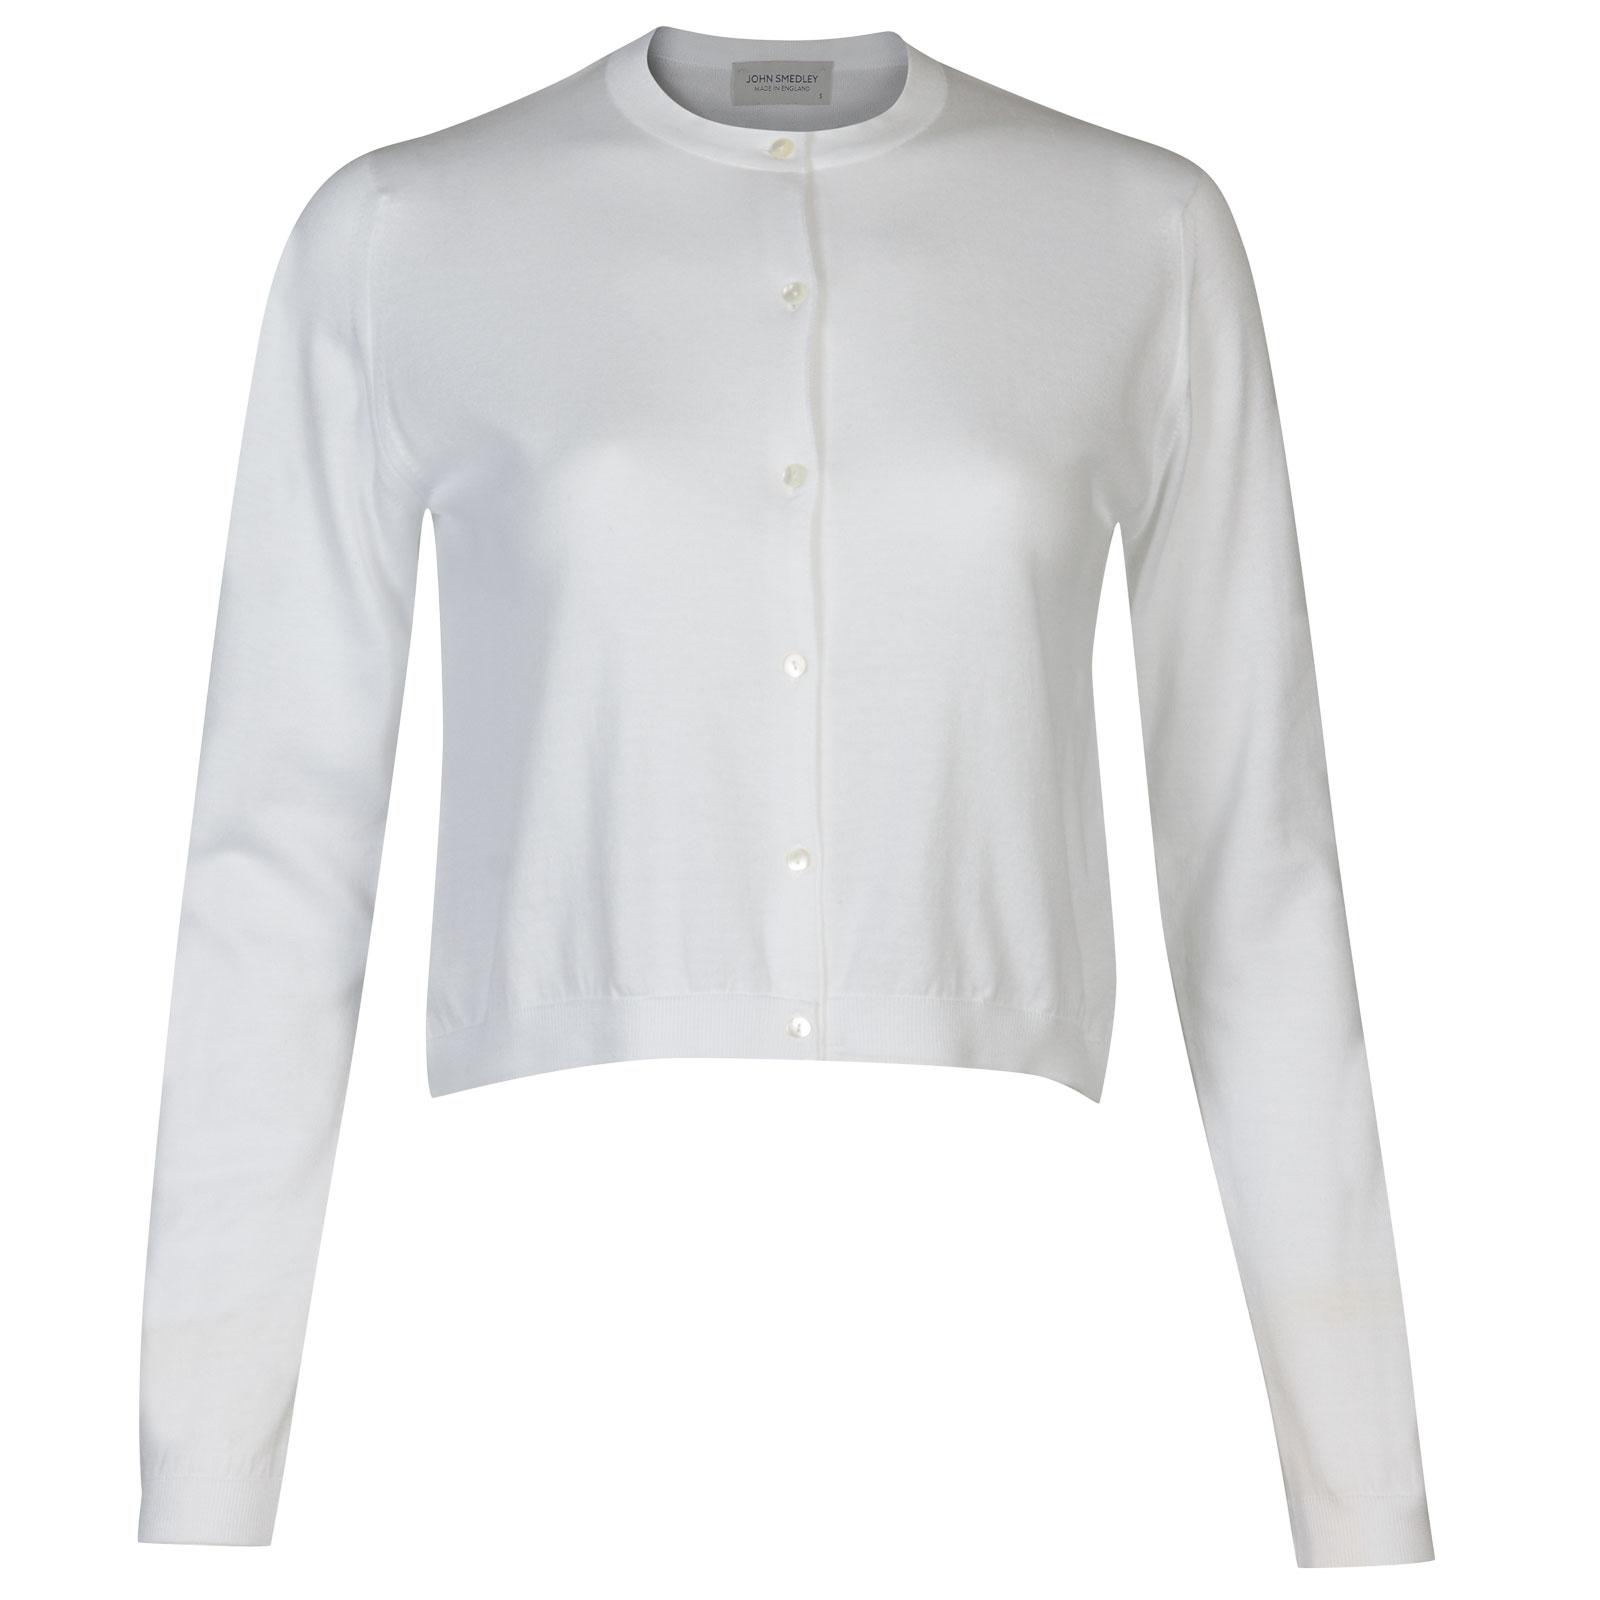 John Smedley Bowes Sea Island Cotton Cardigan in White-S